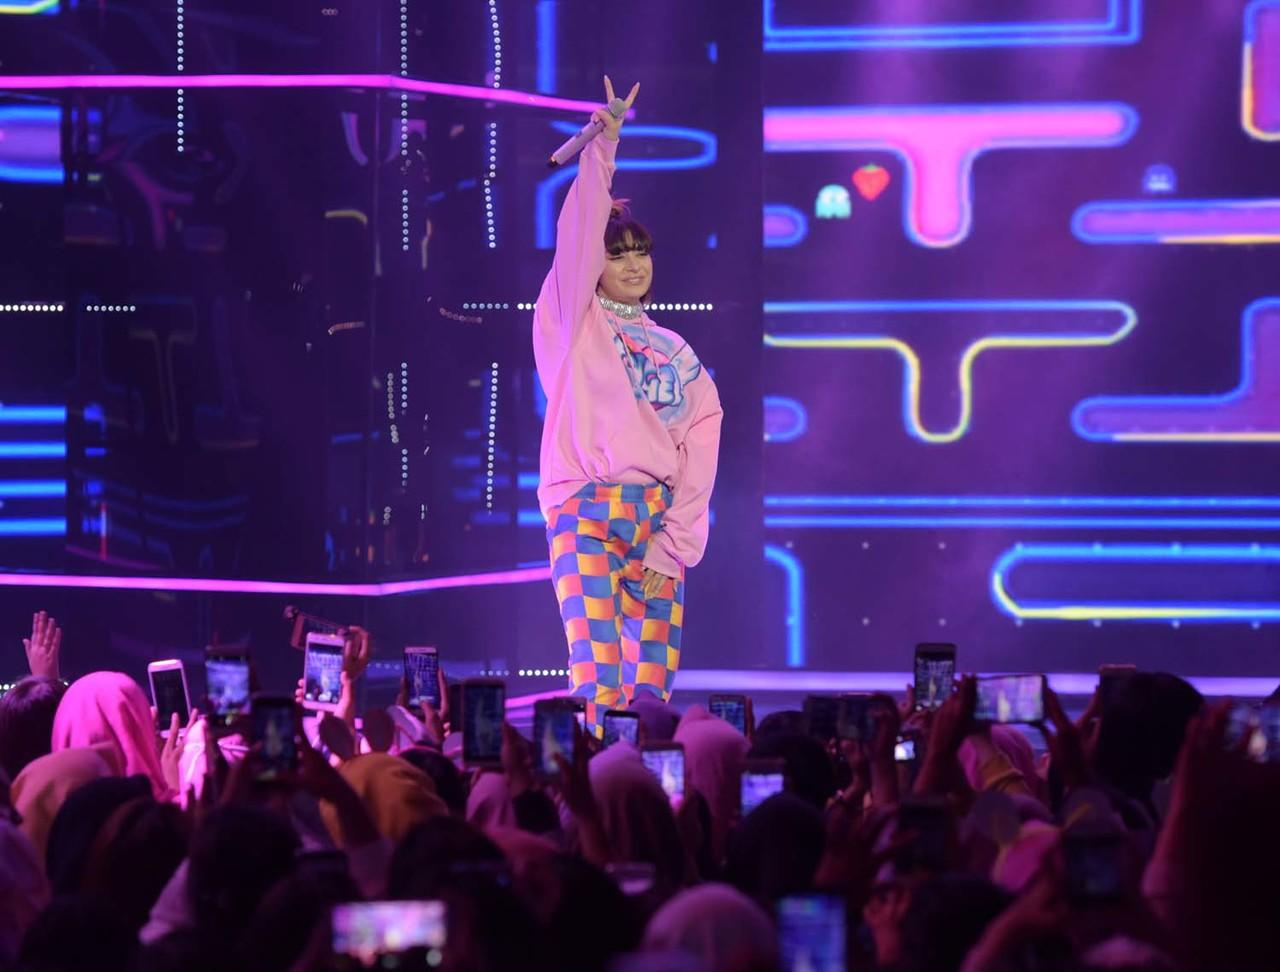 Charli XCX Tampil di Indonesian Television Awards 2018